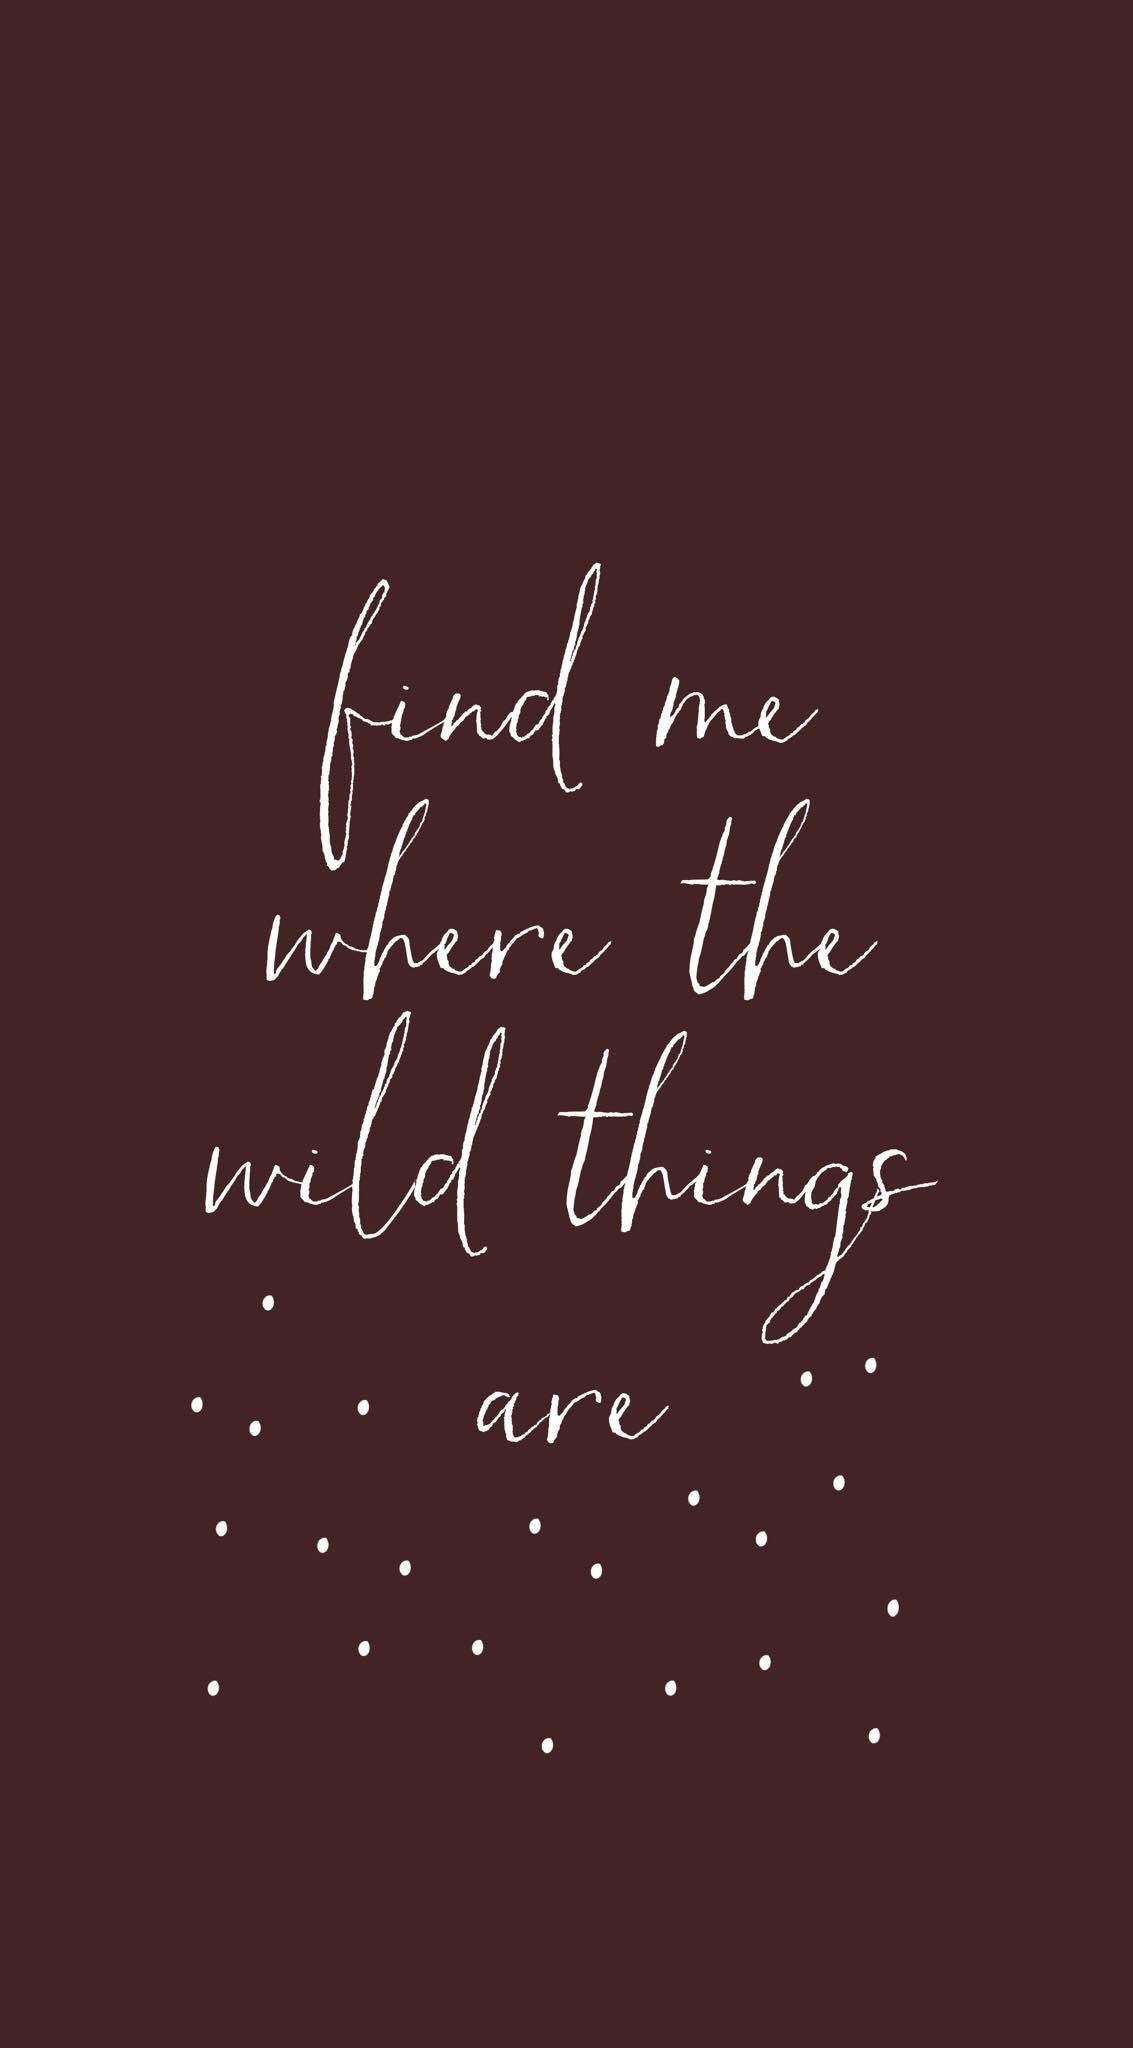 Wallpaper, Phone, Hintergrund, Hintergründe, Handy Hintergrund, Handy Wallpaper, iPhone Wallpaper, Android, quote, zitate, find me where the wild things are